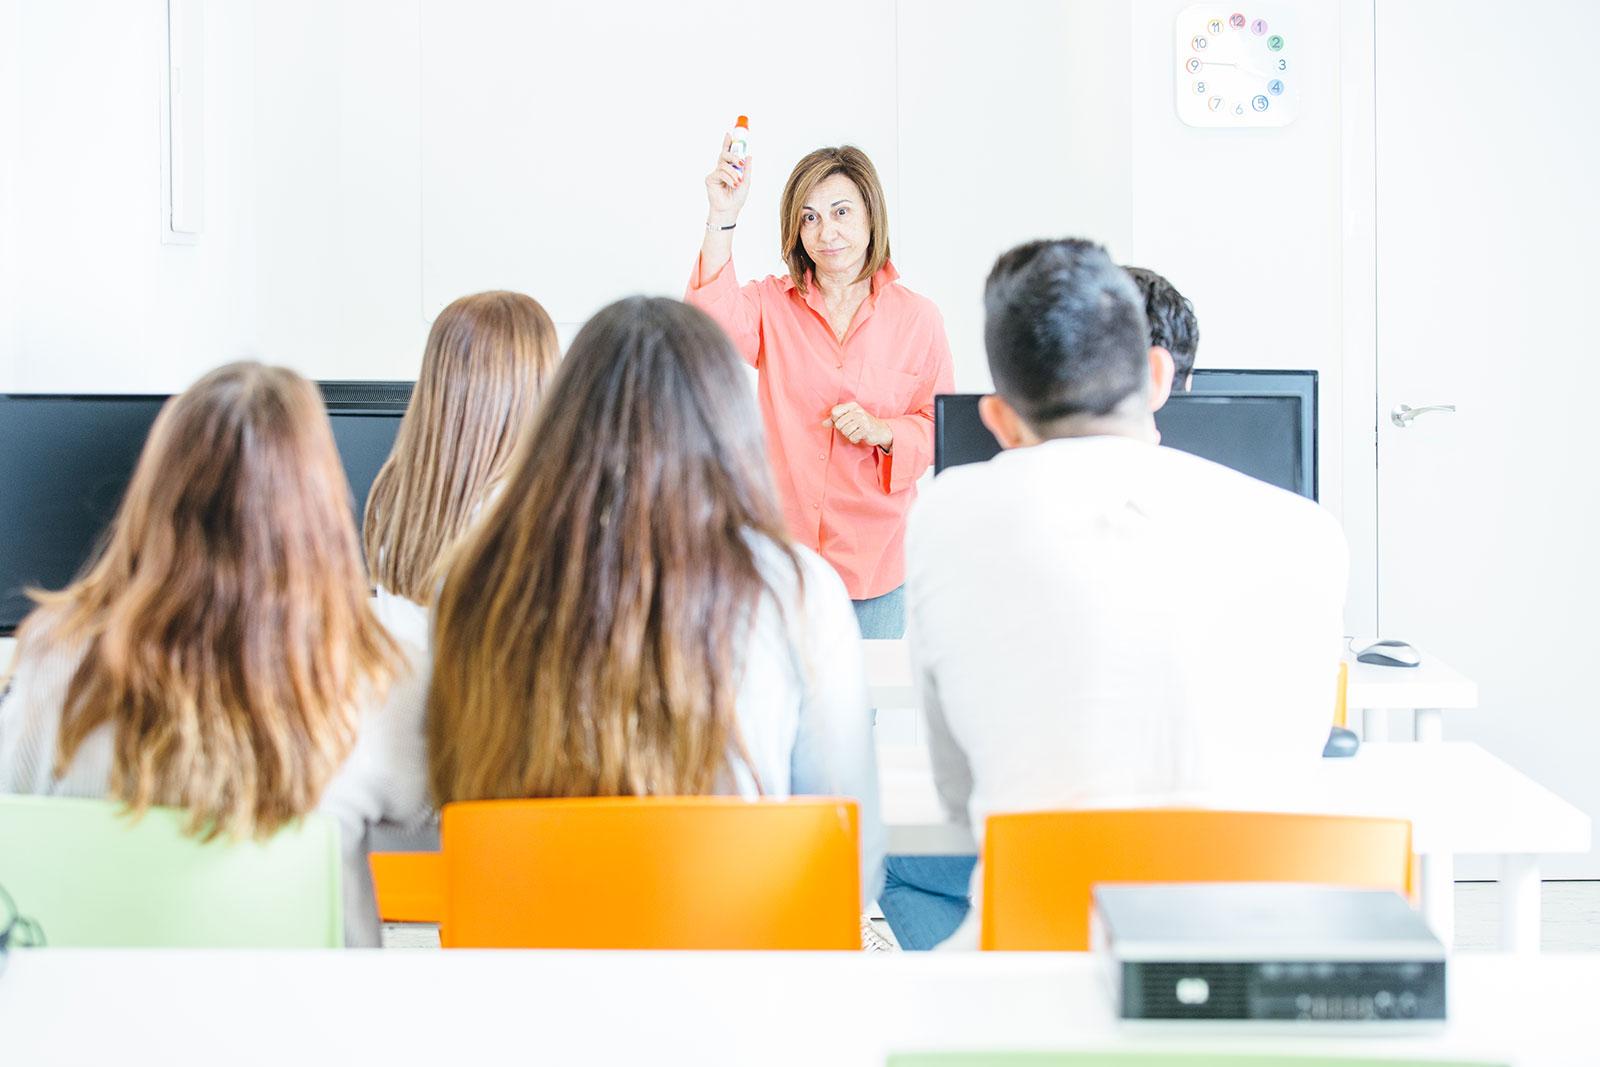 teacher-students-classroom